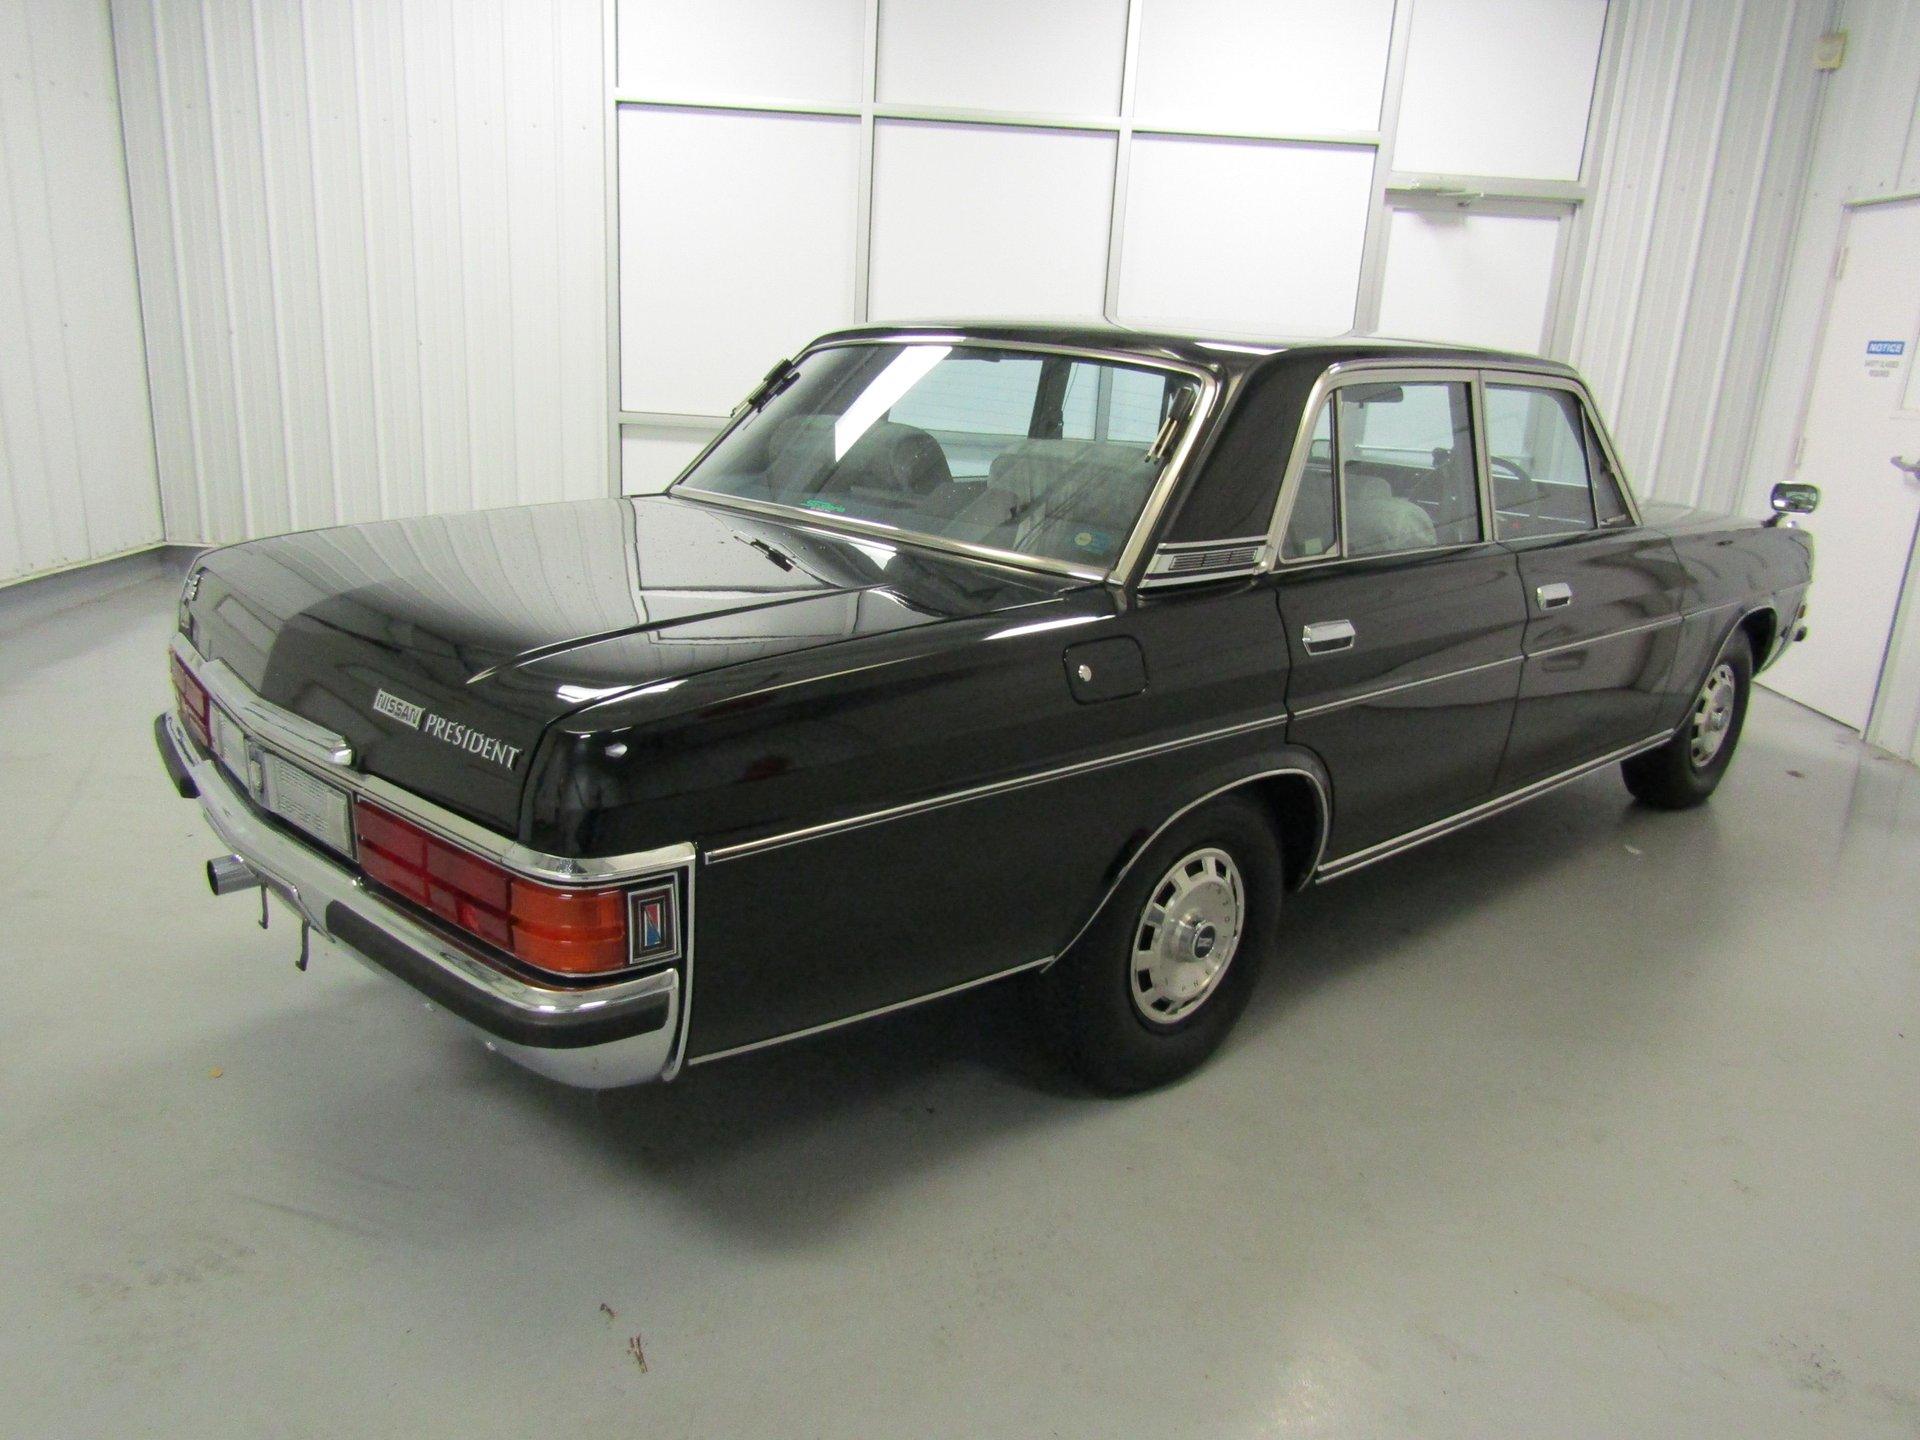 1986 Nissan President